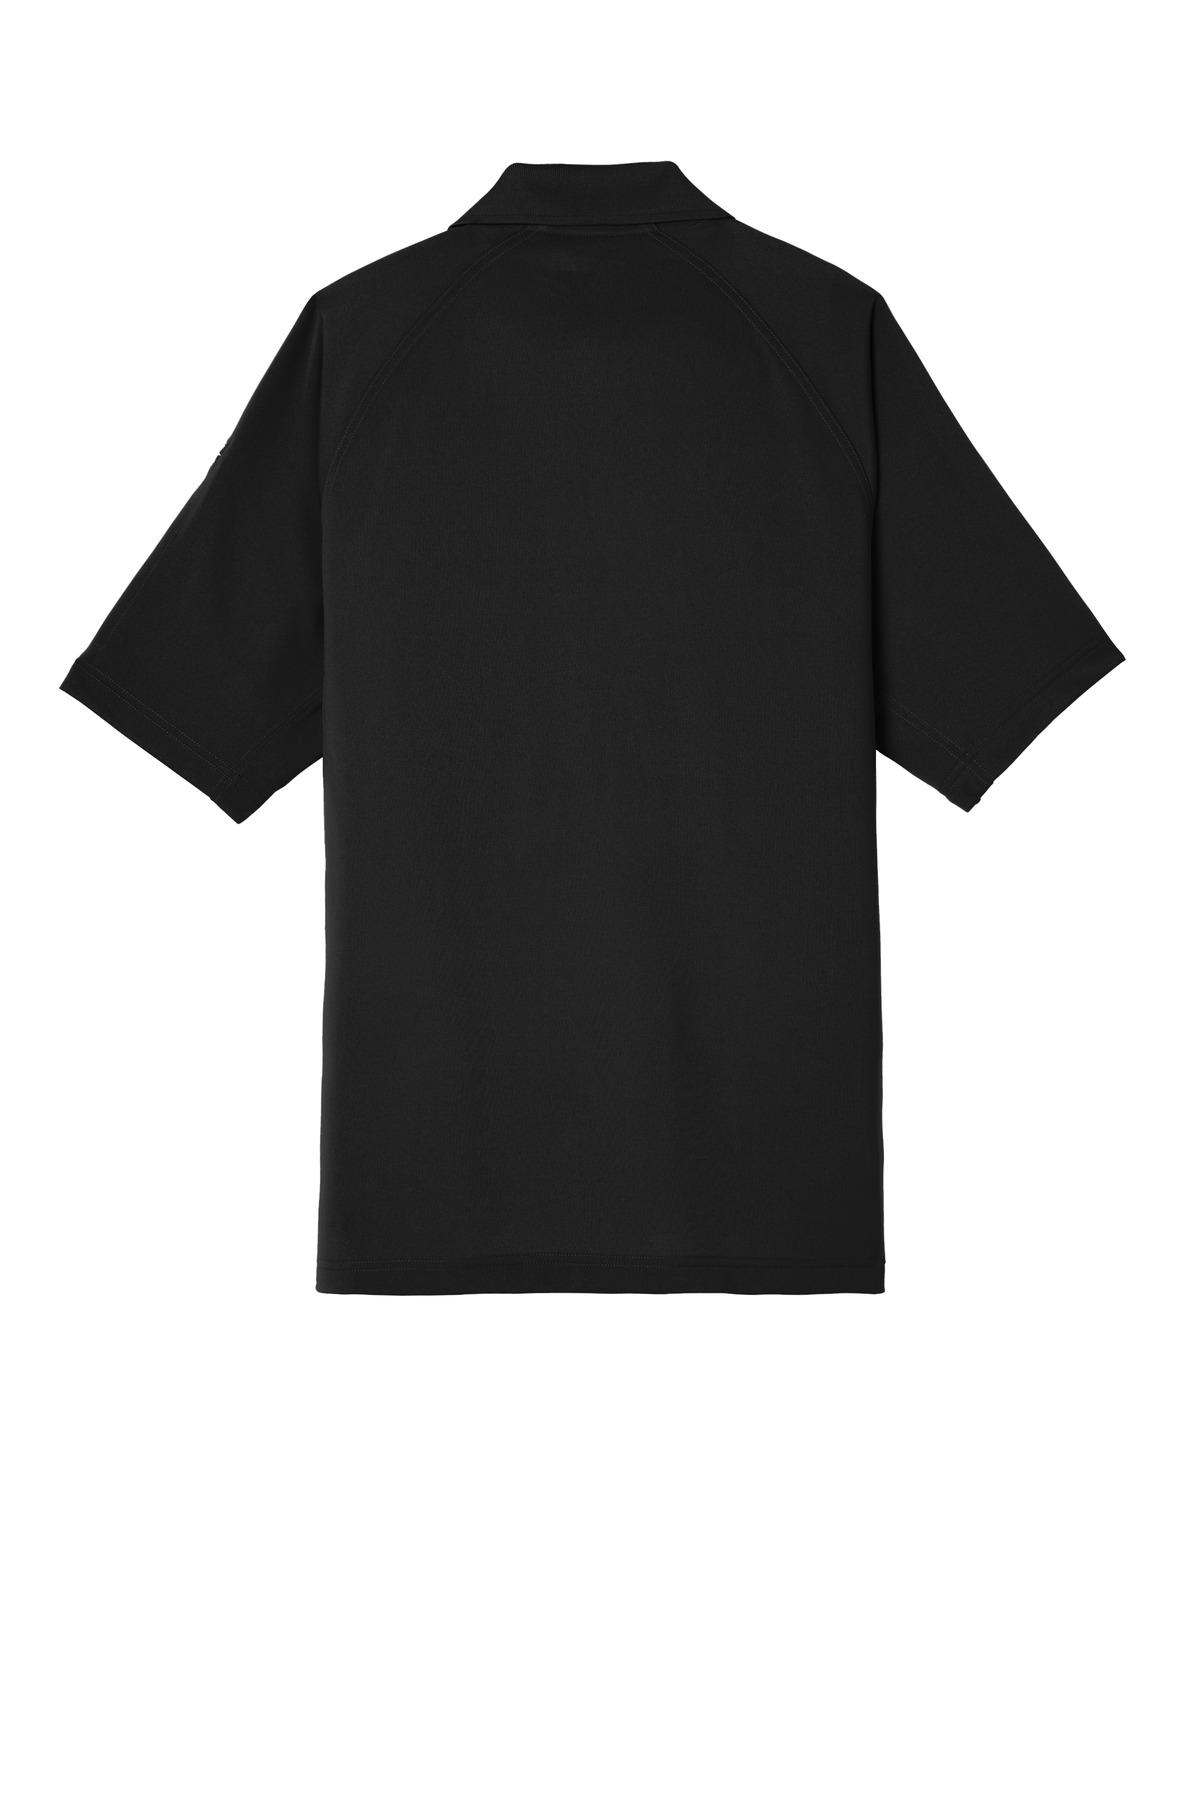 CS black flat back